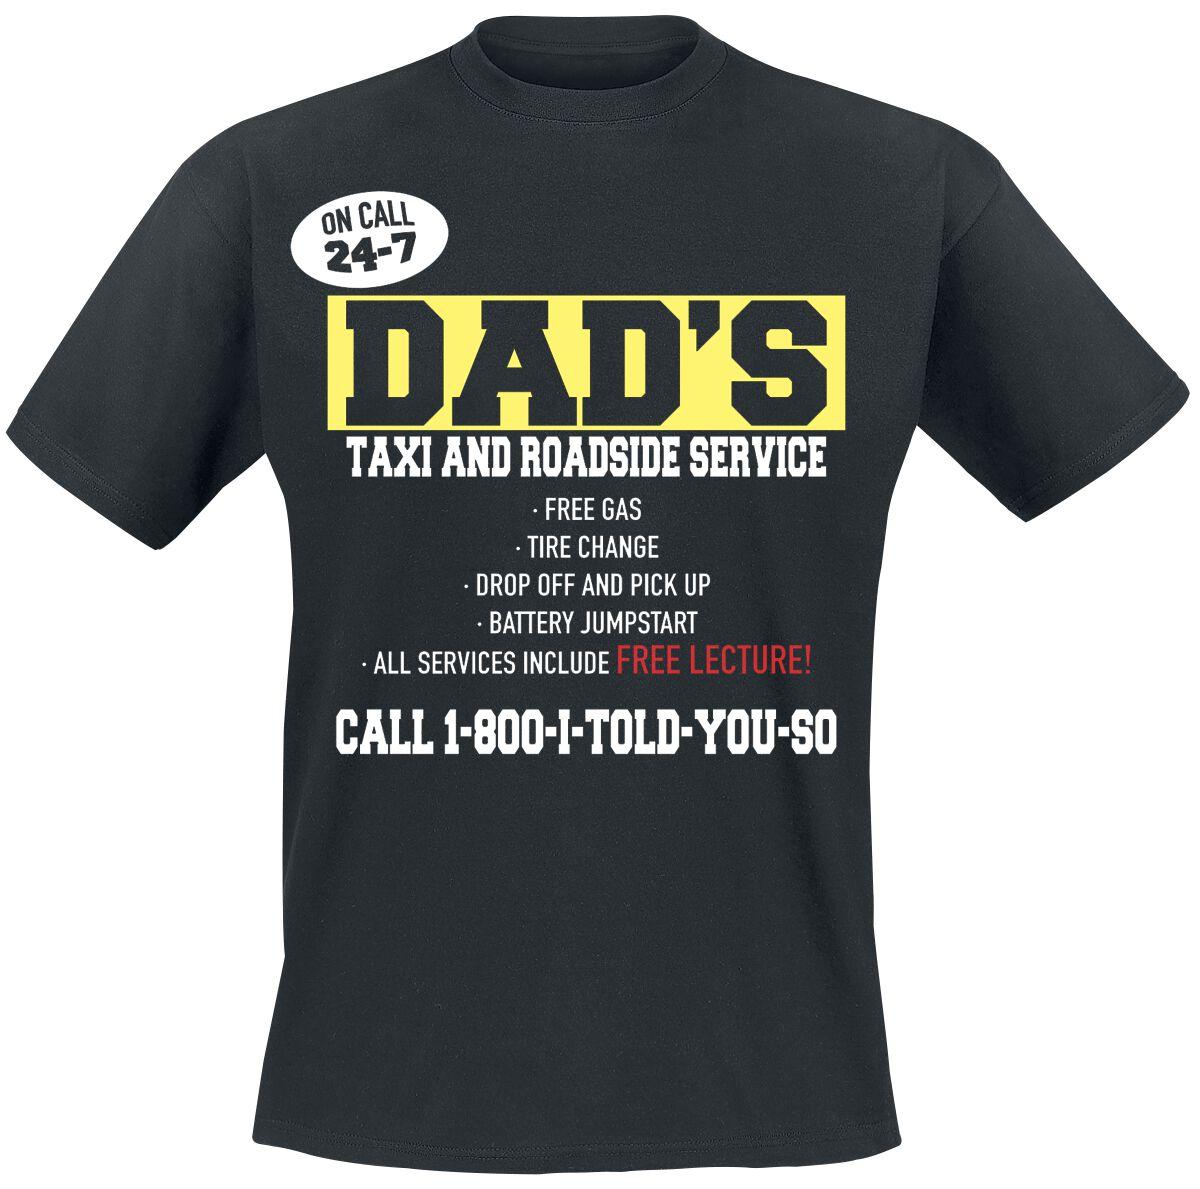 Fun Shirts - Koszulki - T-Shirt Dad`s Taxi And Roadside Service T-Shirt czarny - 376575